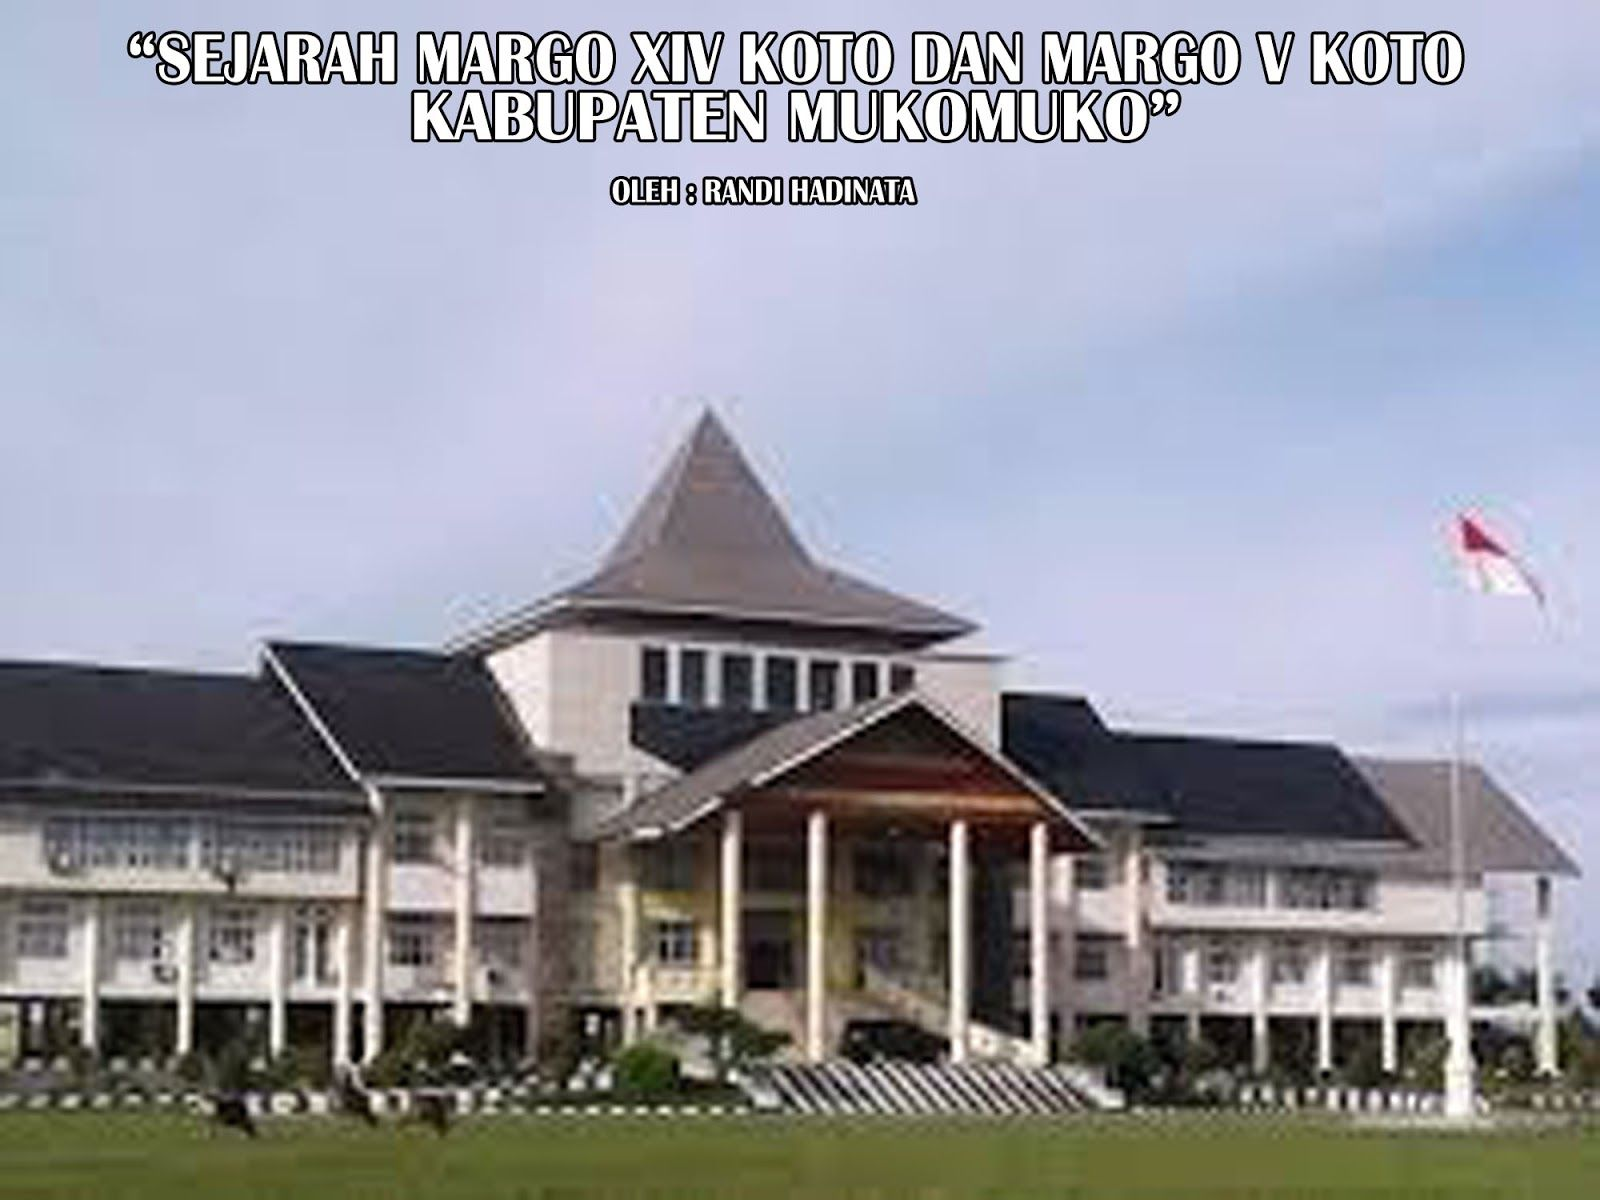 Sejarah Margo Xiv Koto Dan V Koto Di Kabupaten Mukomuko Kompasiana Com